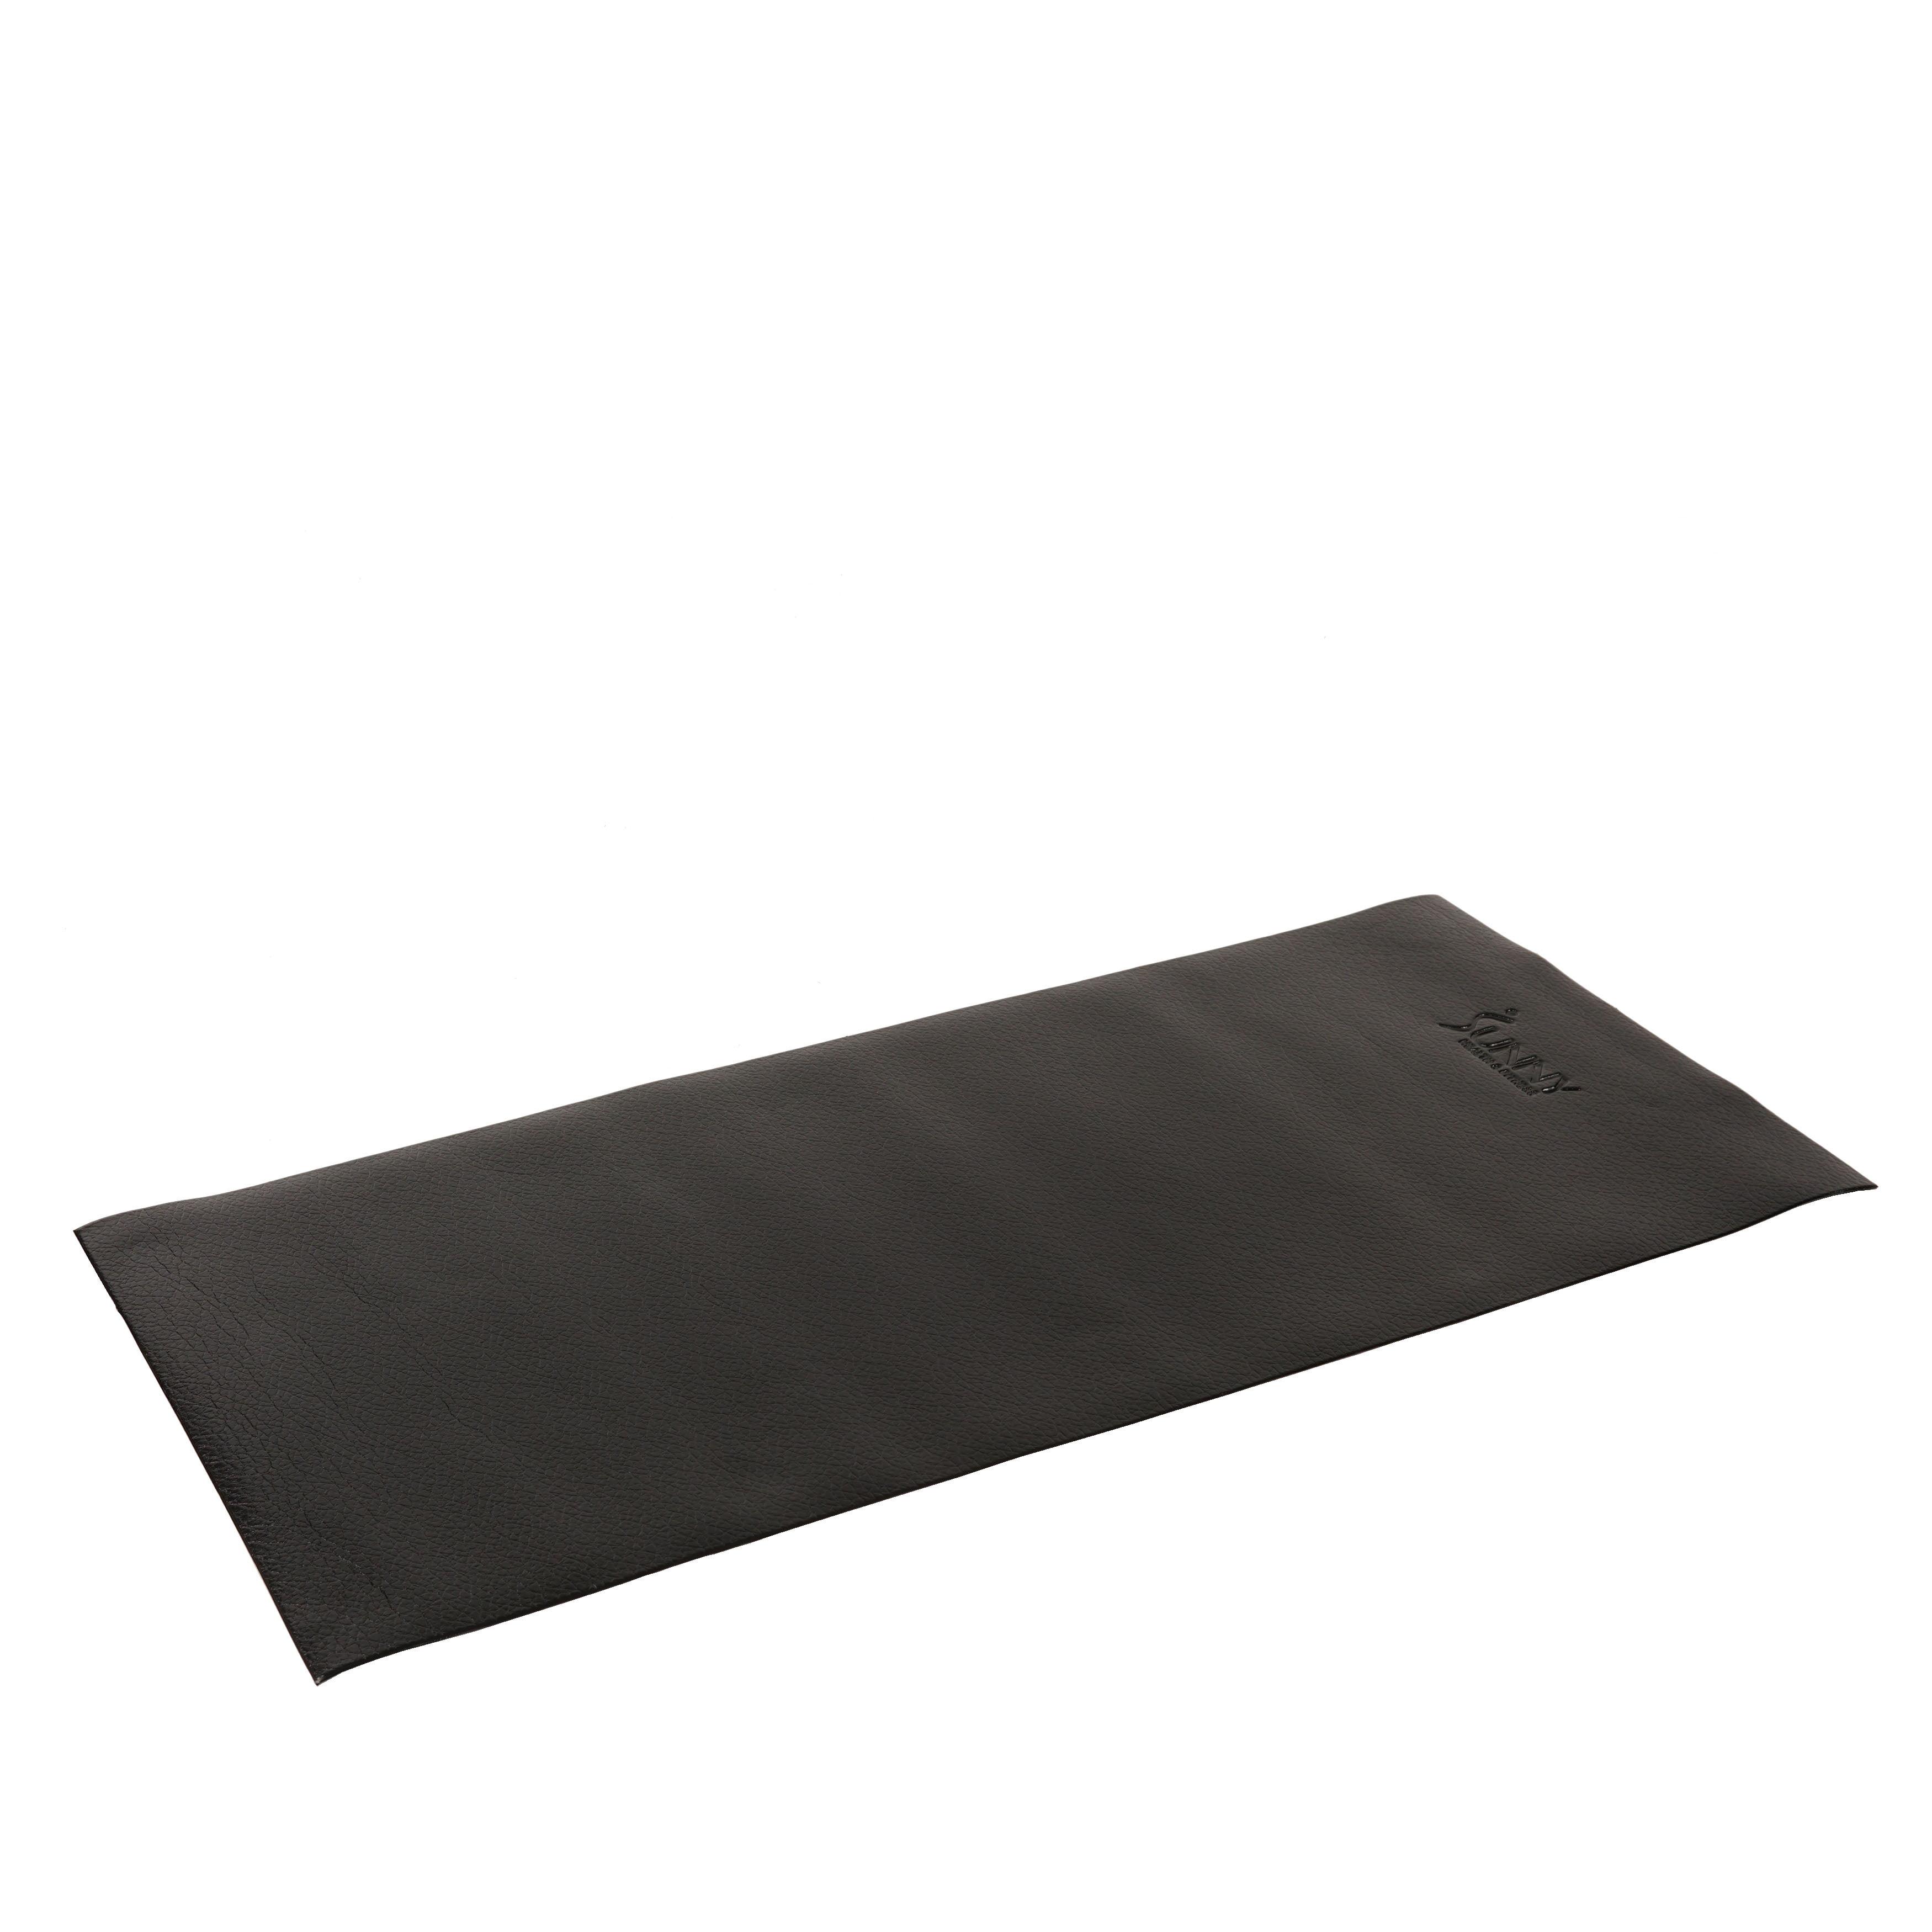 Sunny Health & Fitness 4' x 2' Fitness Equipment Floor Mat by Sunny Health & Fitness